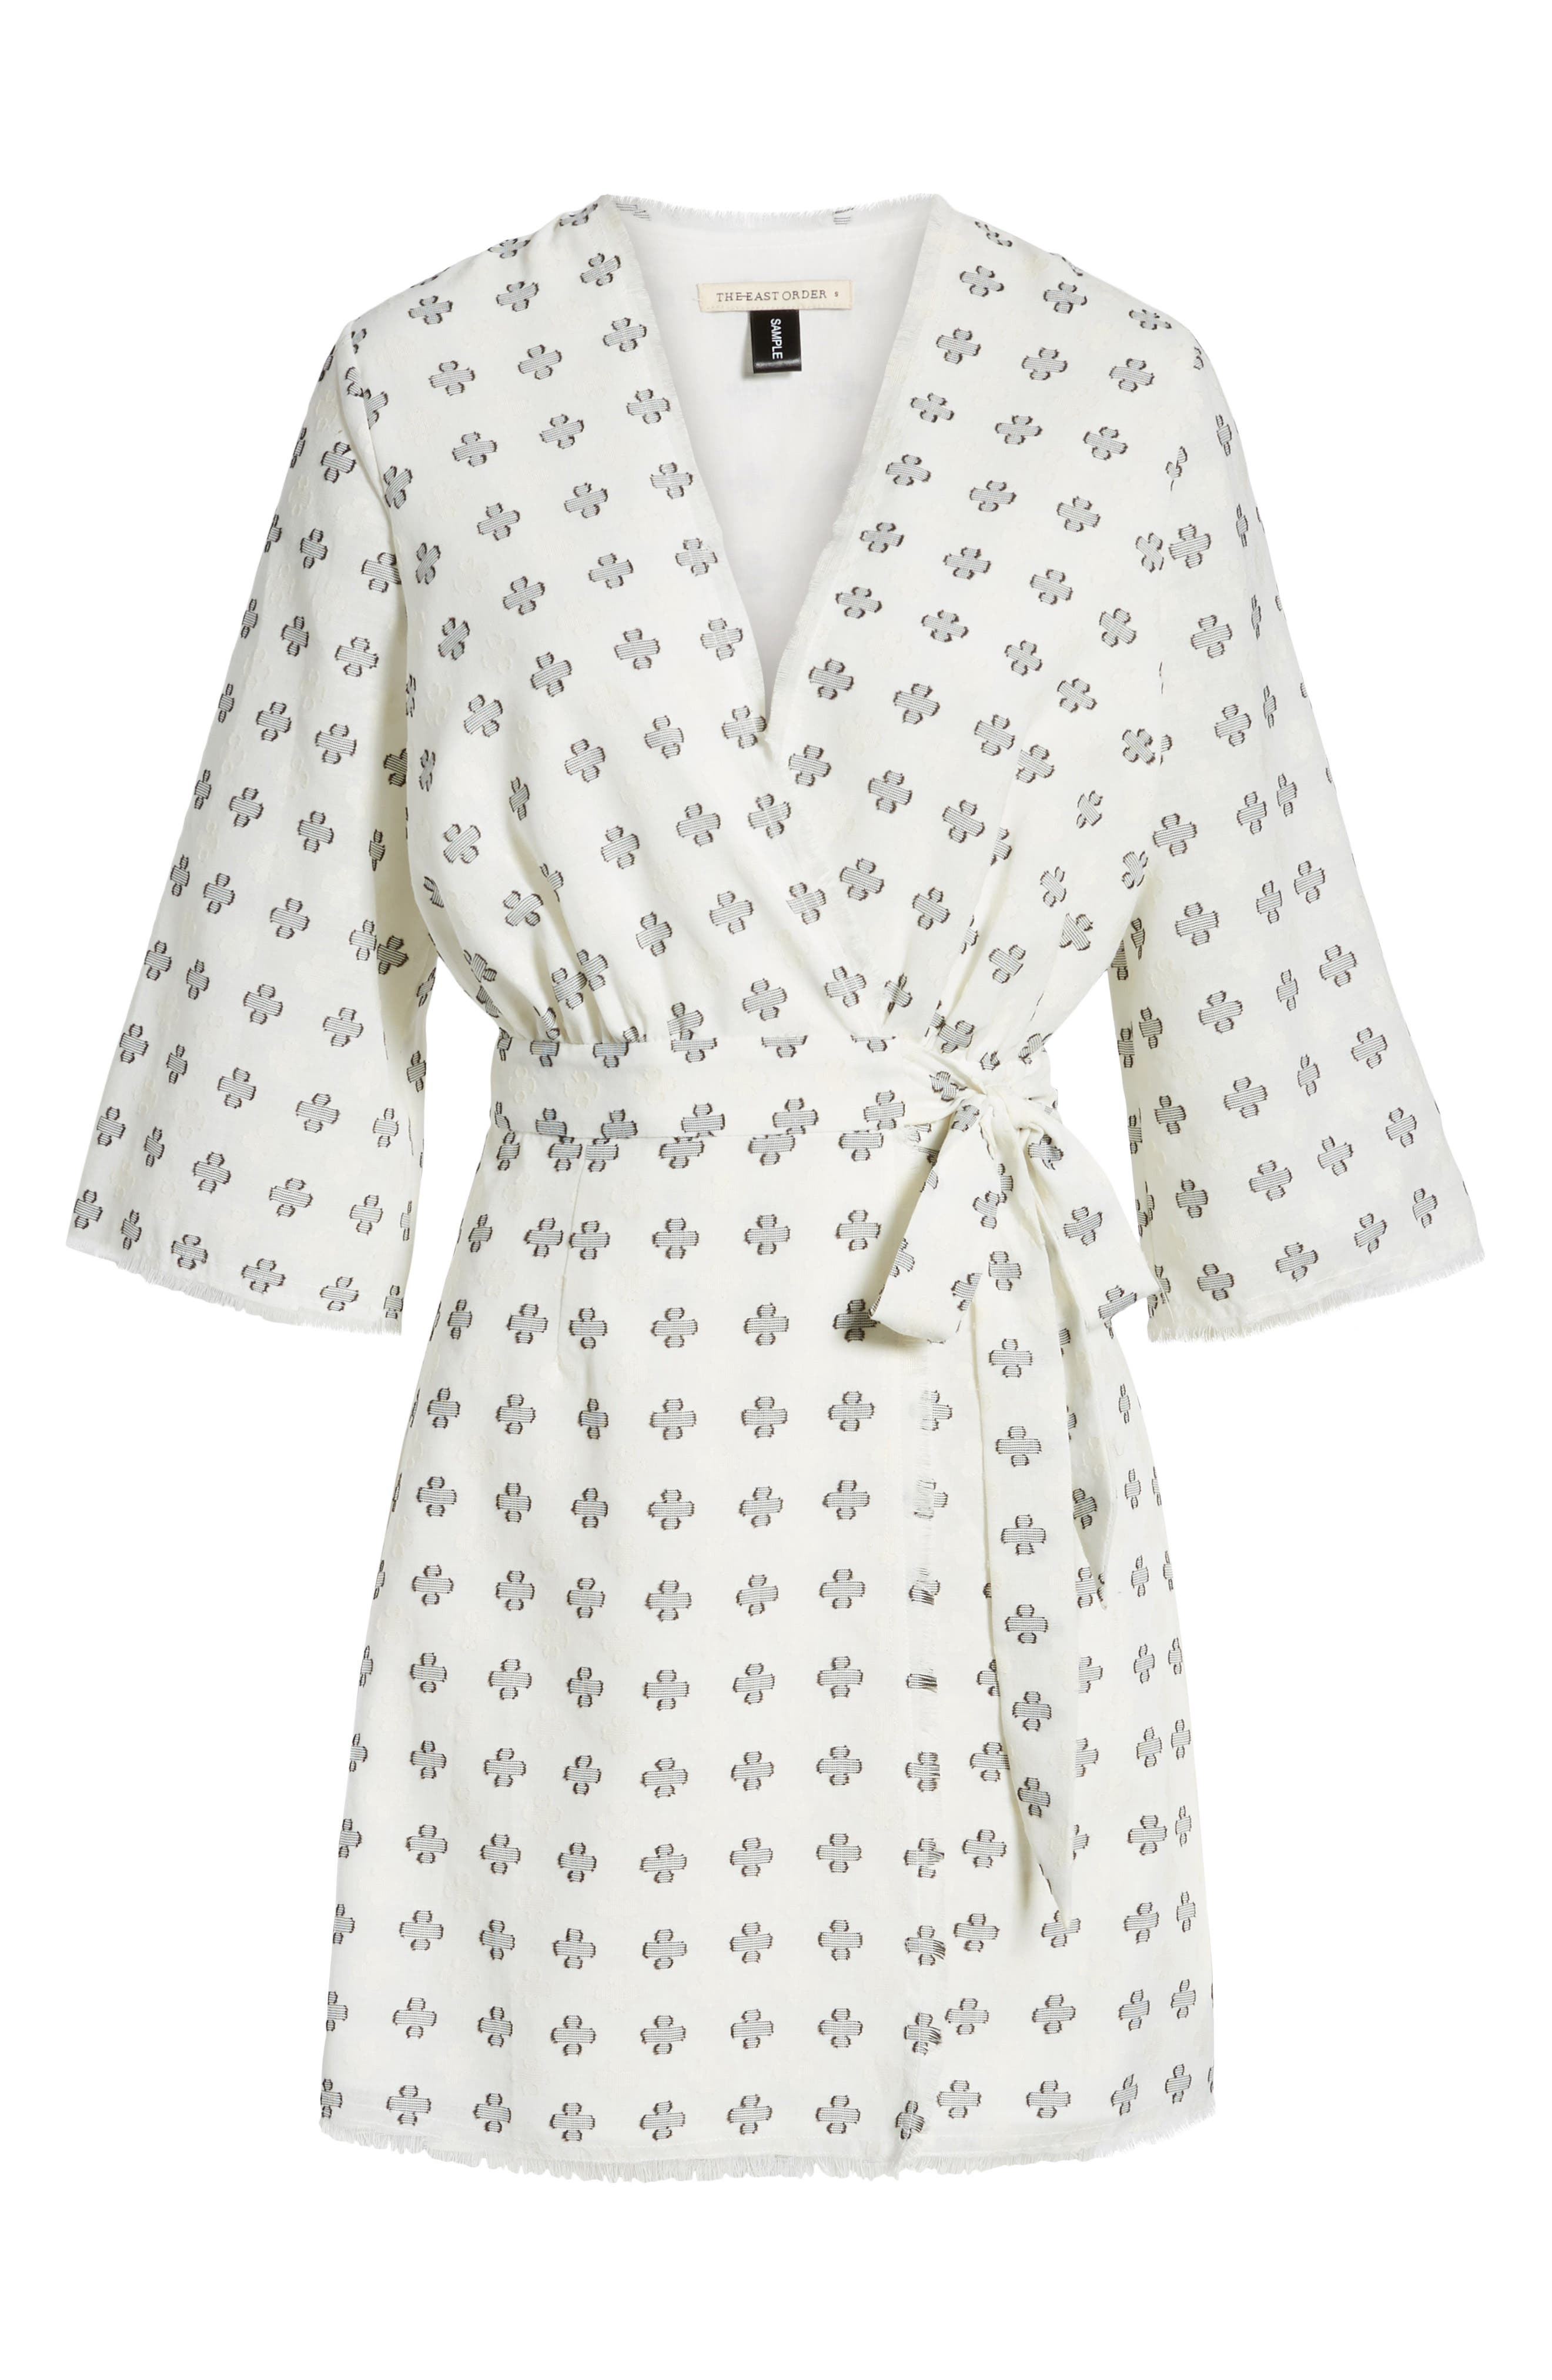 Ruth Wrap Minidress,                             Alternate thumbnail 7, color,                             BLACK AND WHITE CLOVER